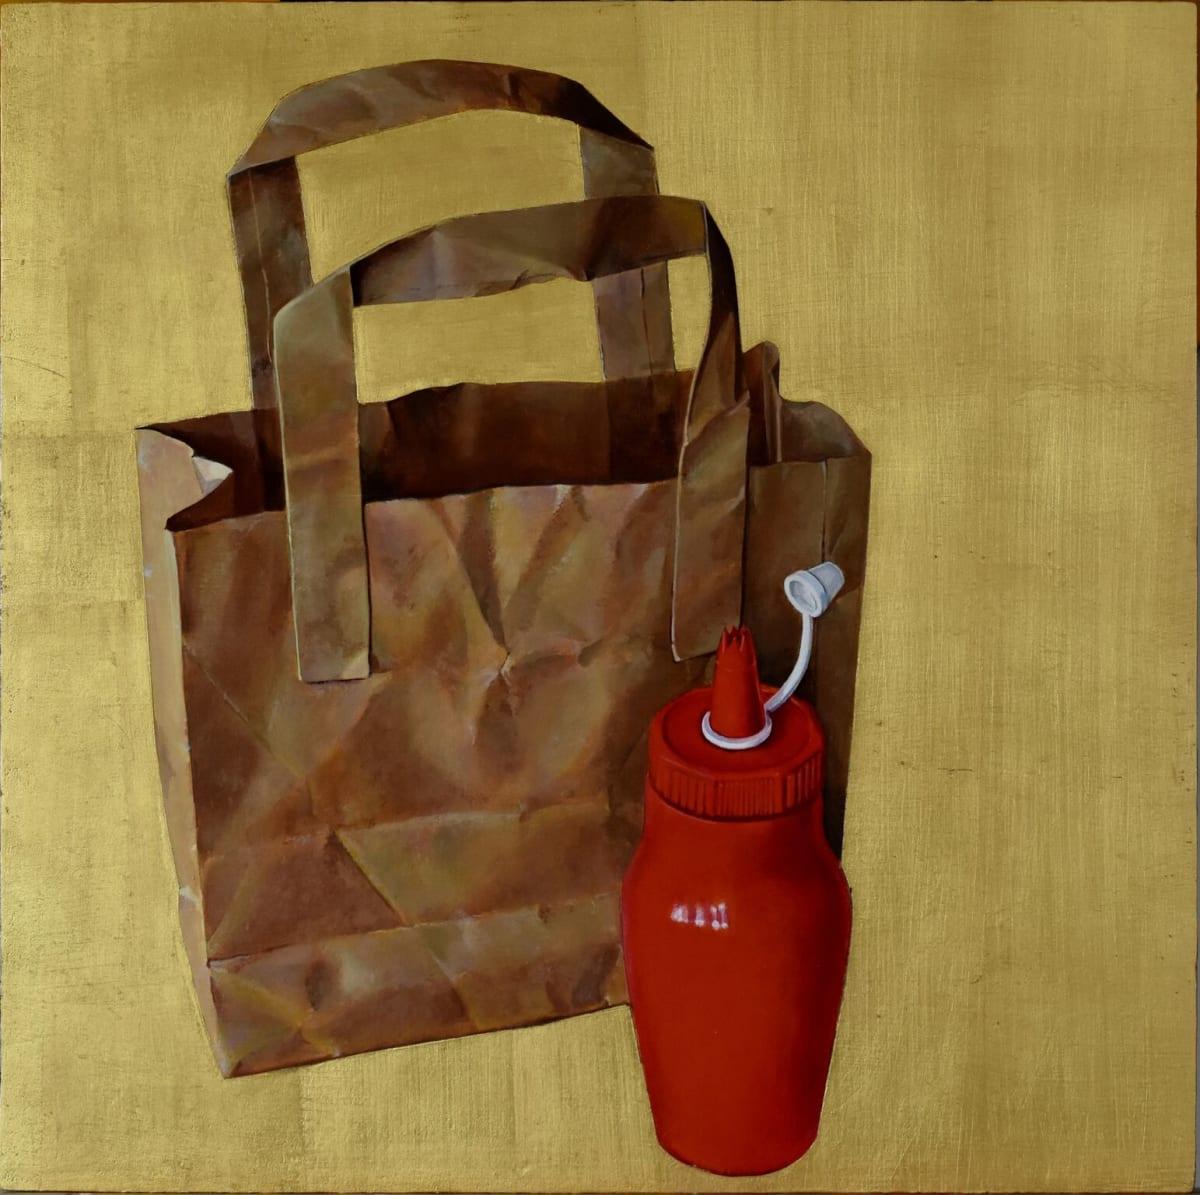 Cynthia Poole Paperbag Acrylic on gessoed board with gold leaf 51 x 51 cm